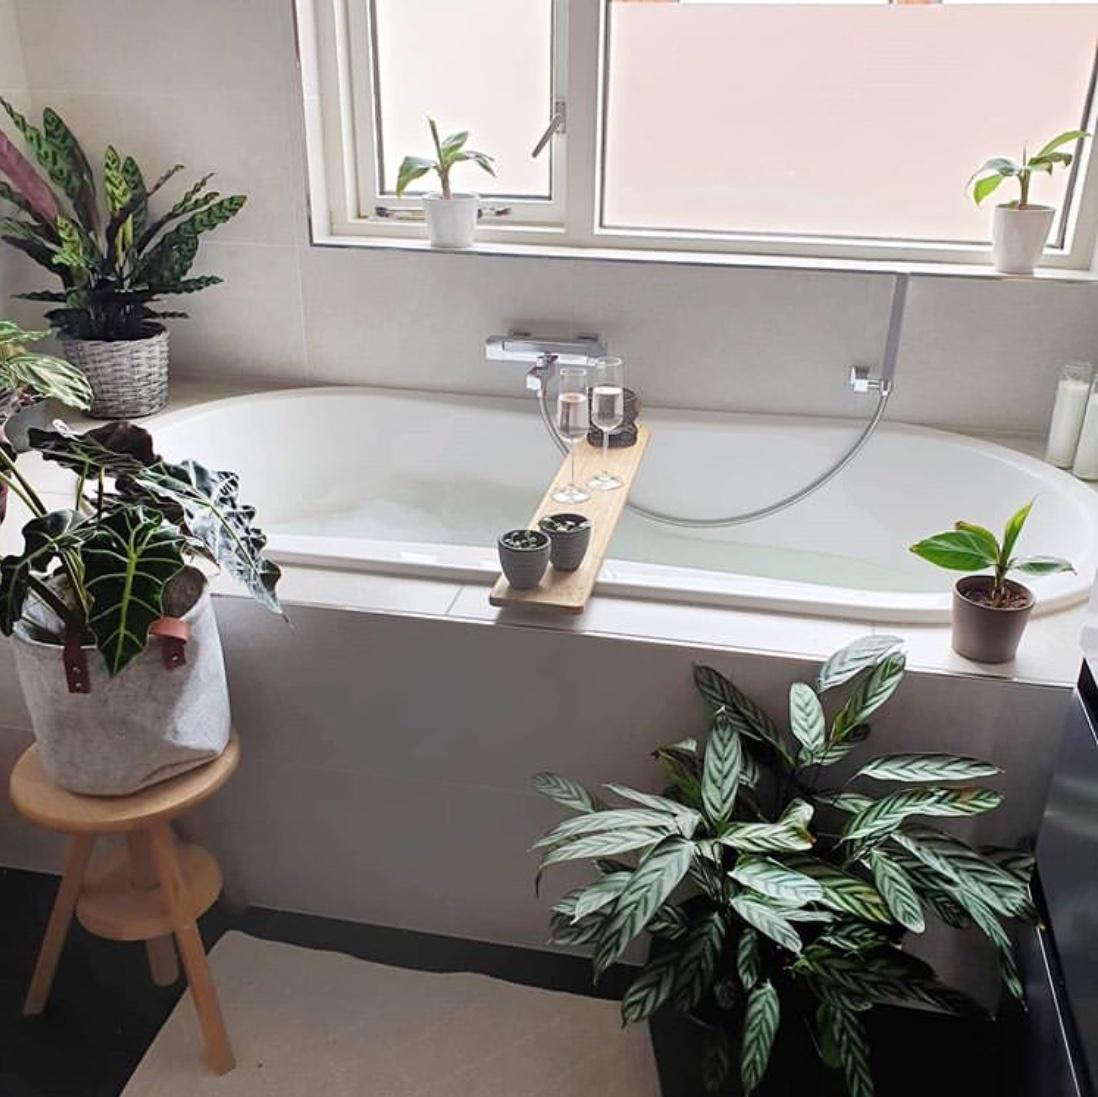 Decorate bathroom with plants